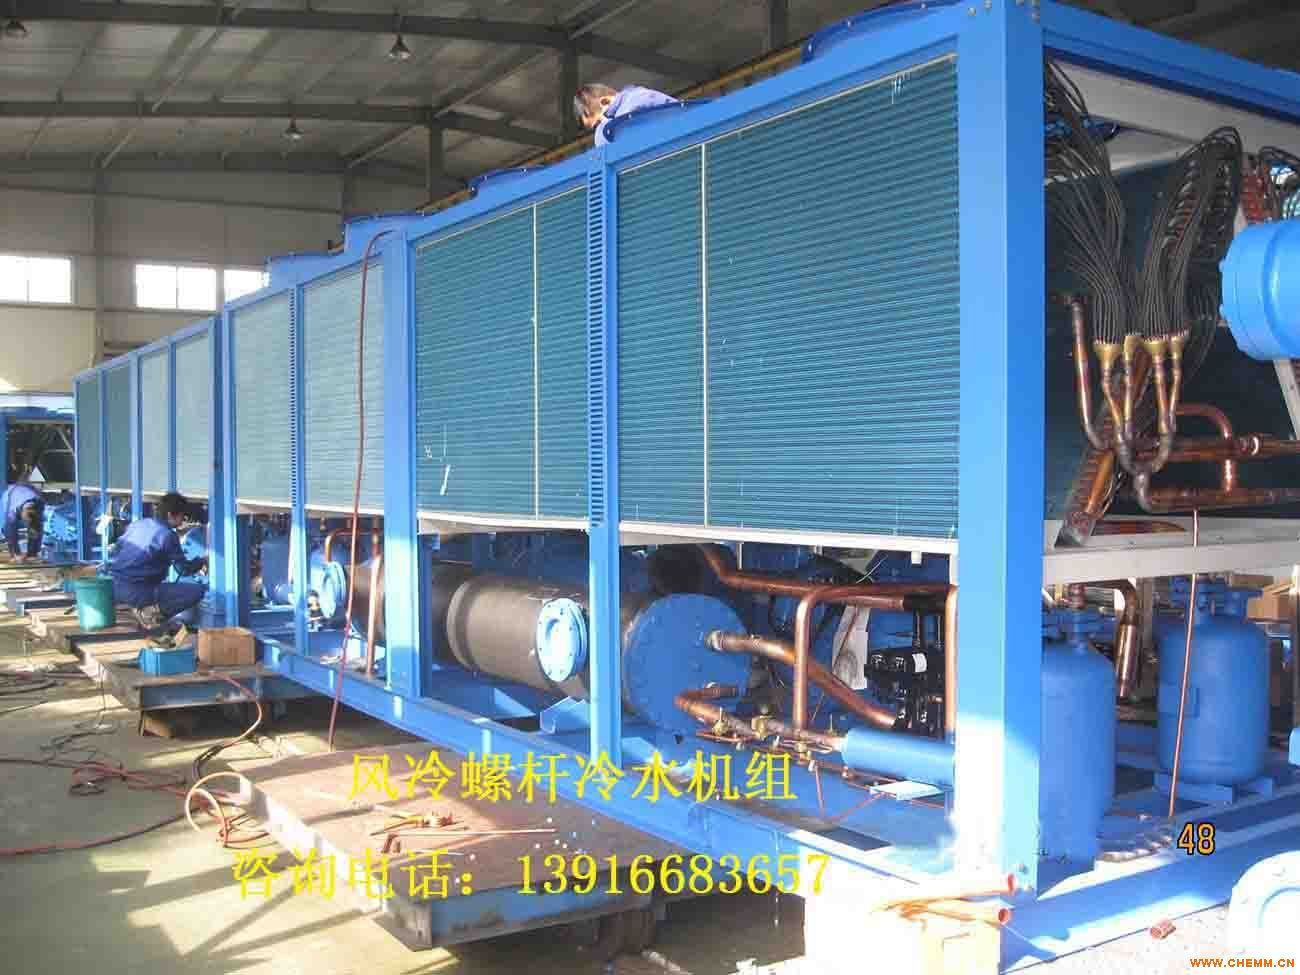 HYS-90AS(G)HYS-90AHS上海瀚艺风冷螺杆冷热水机组